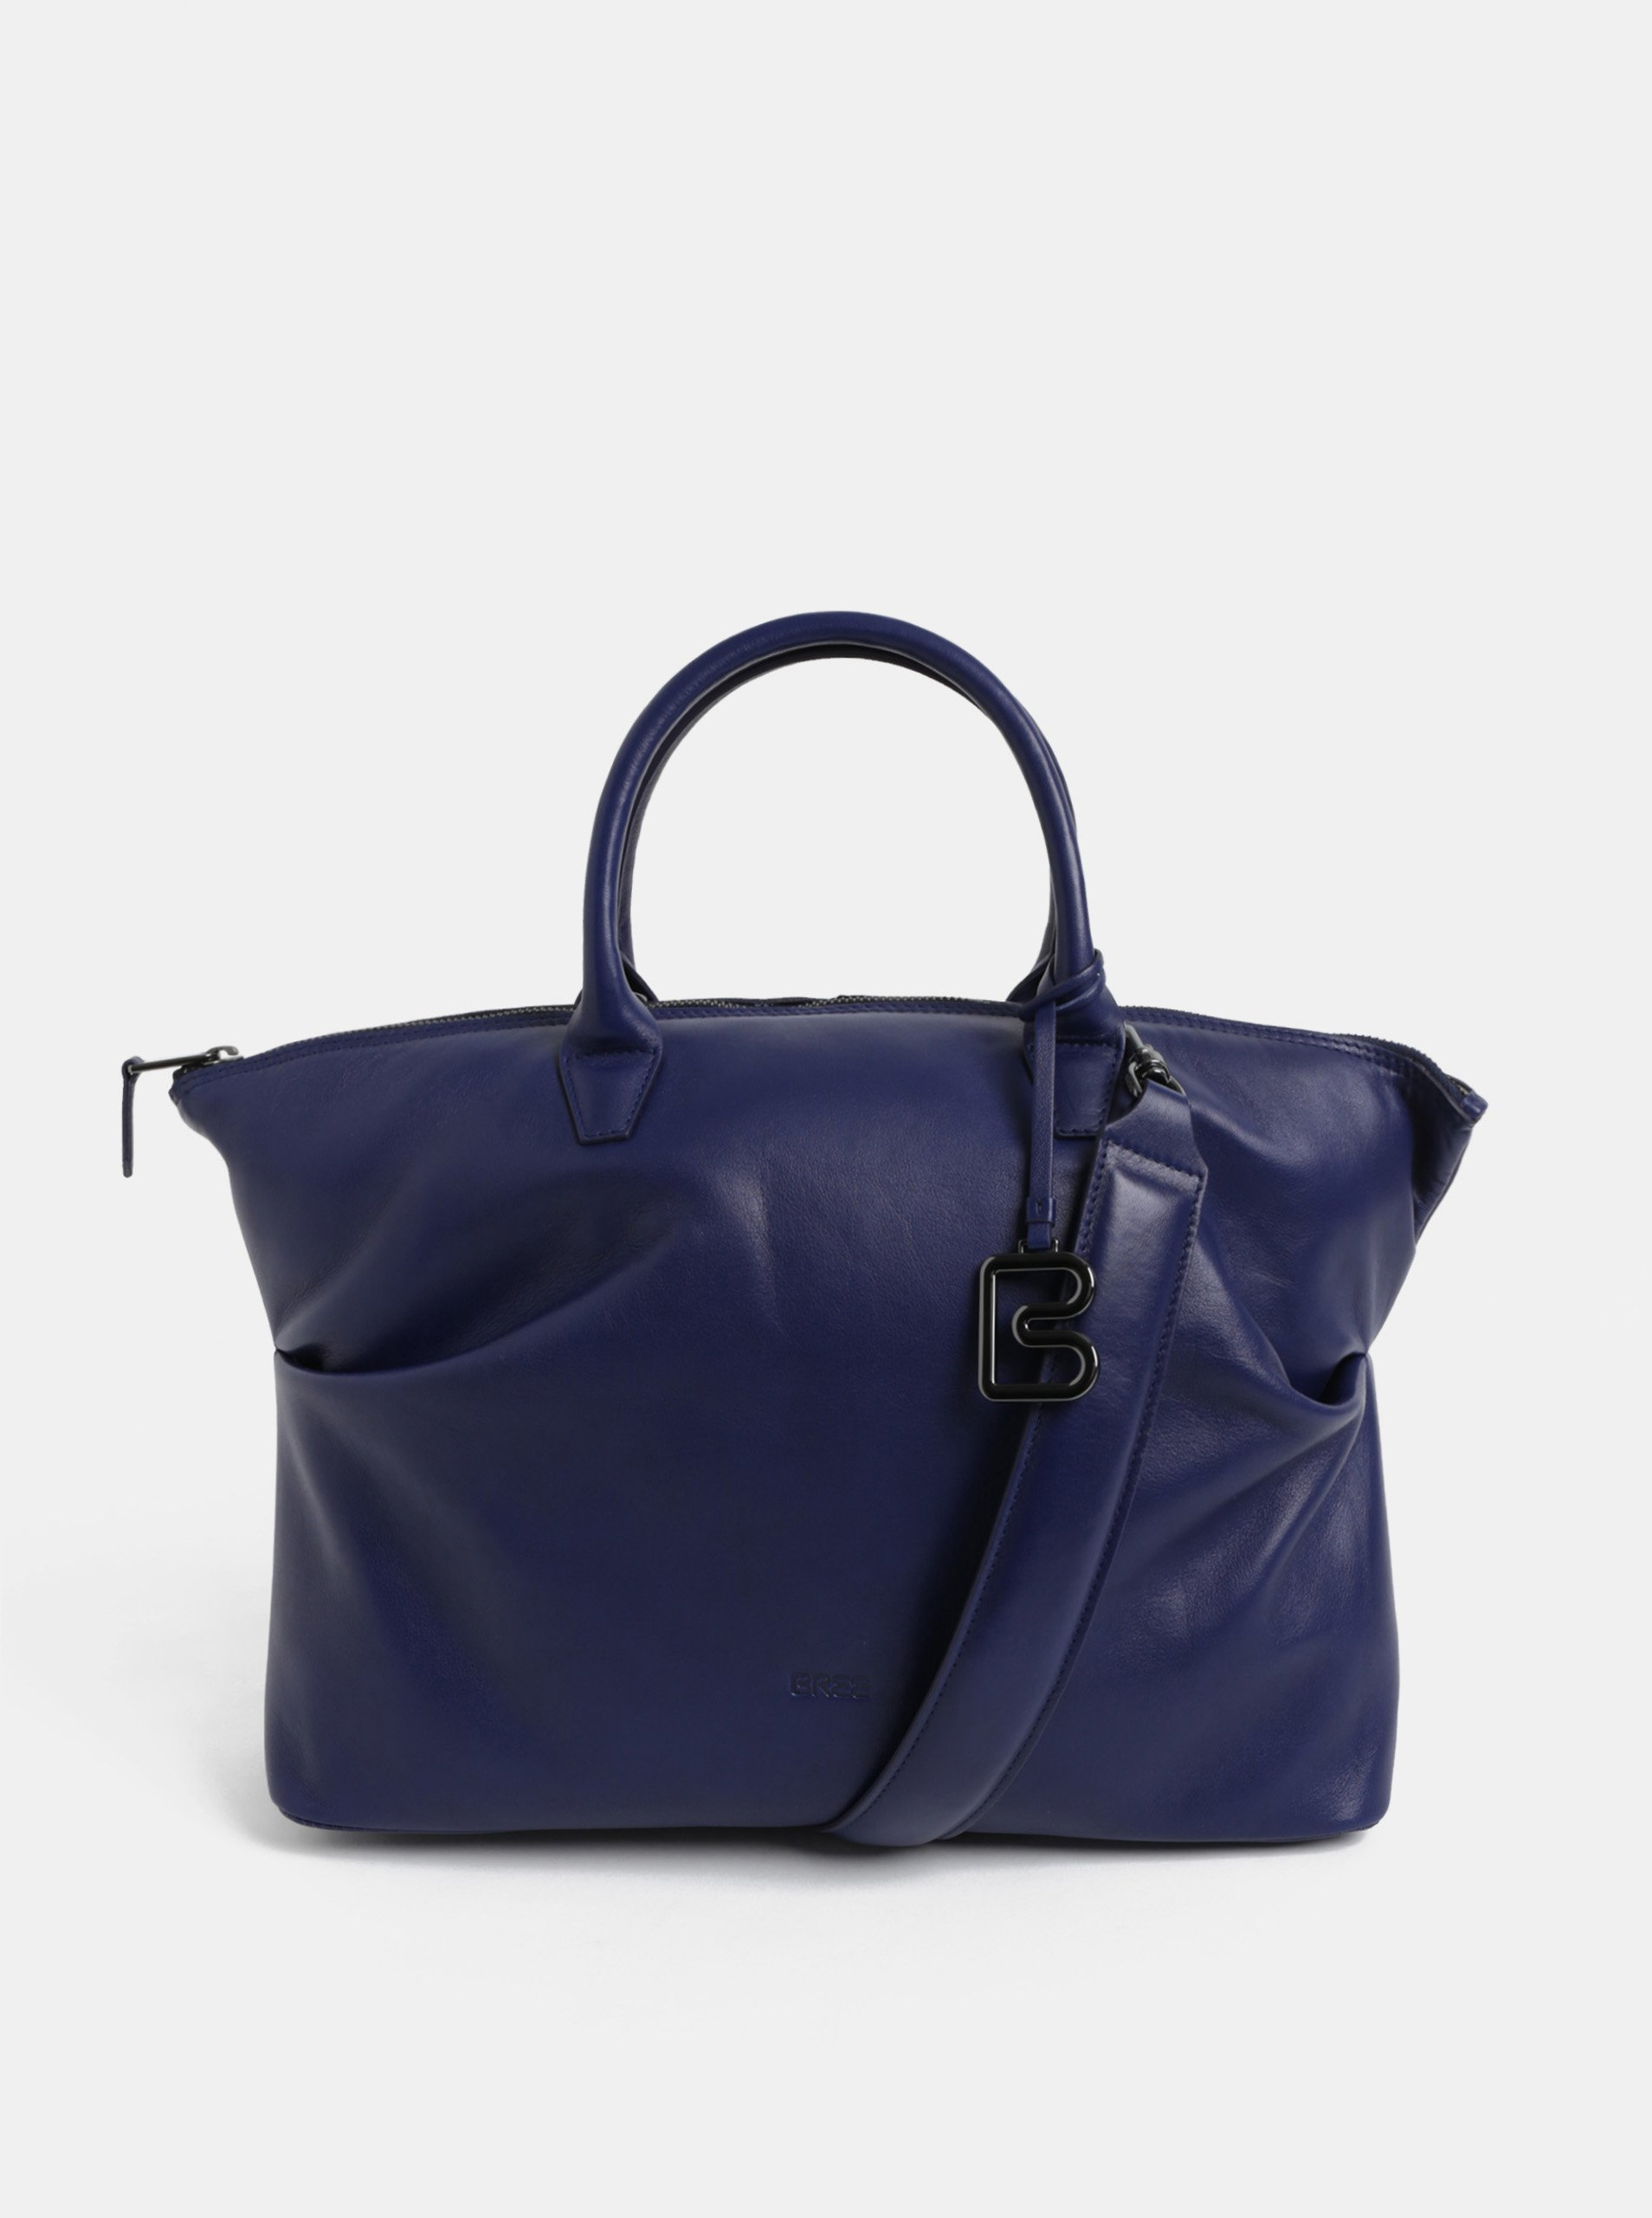 Modrá velká kožená kabelka do ruky BREE Stockholm 37